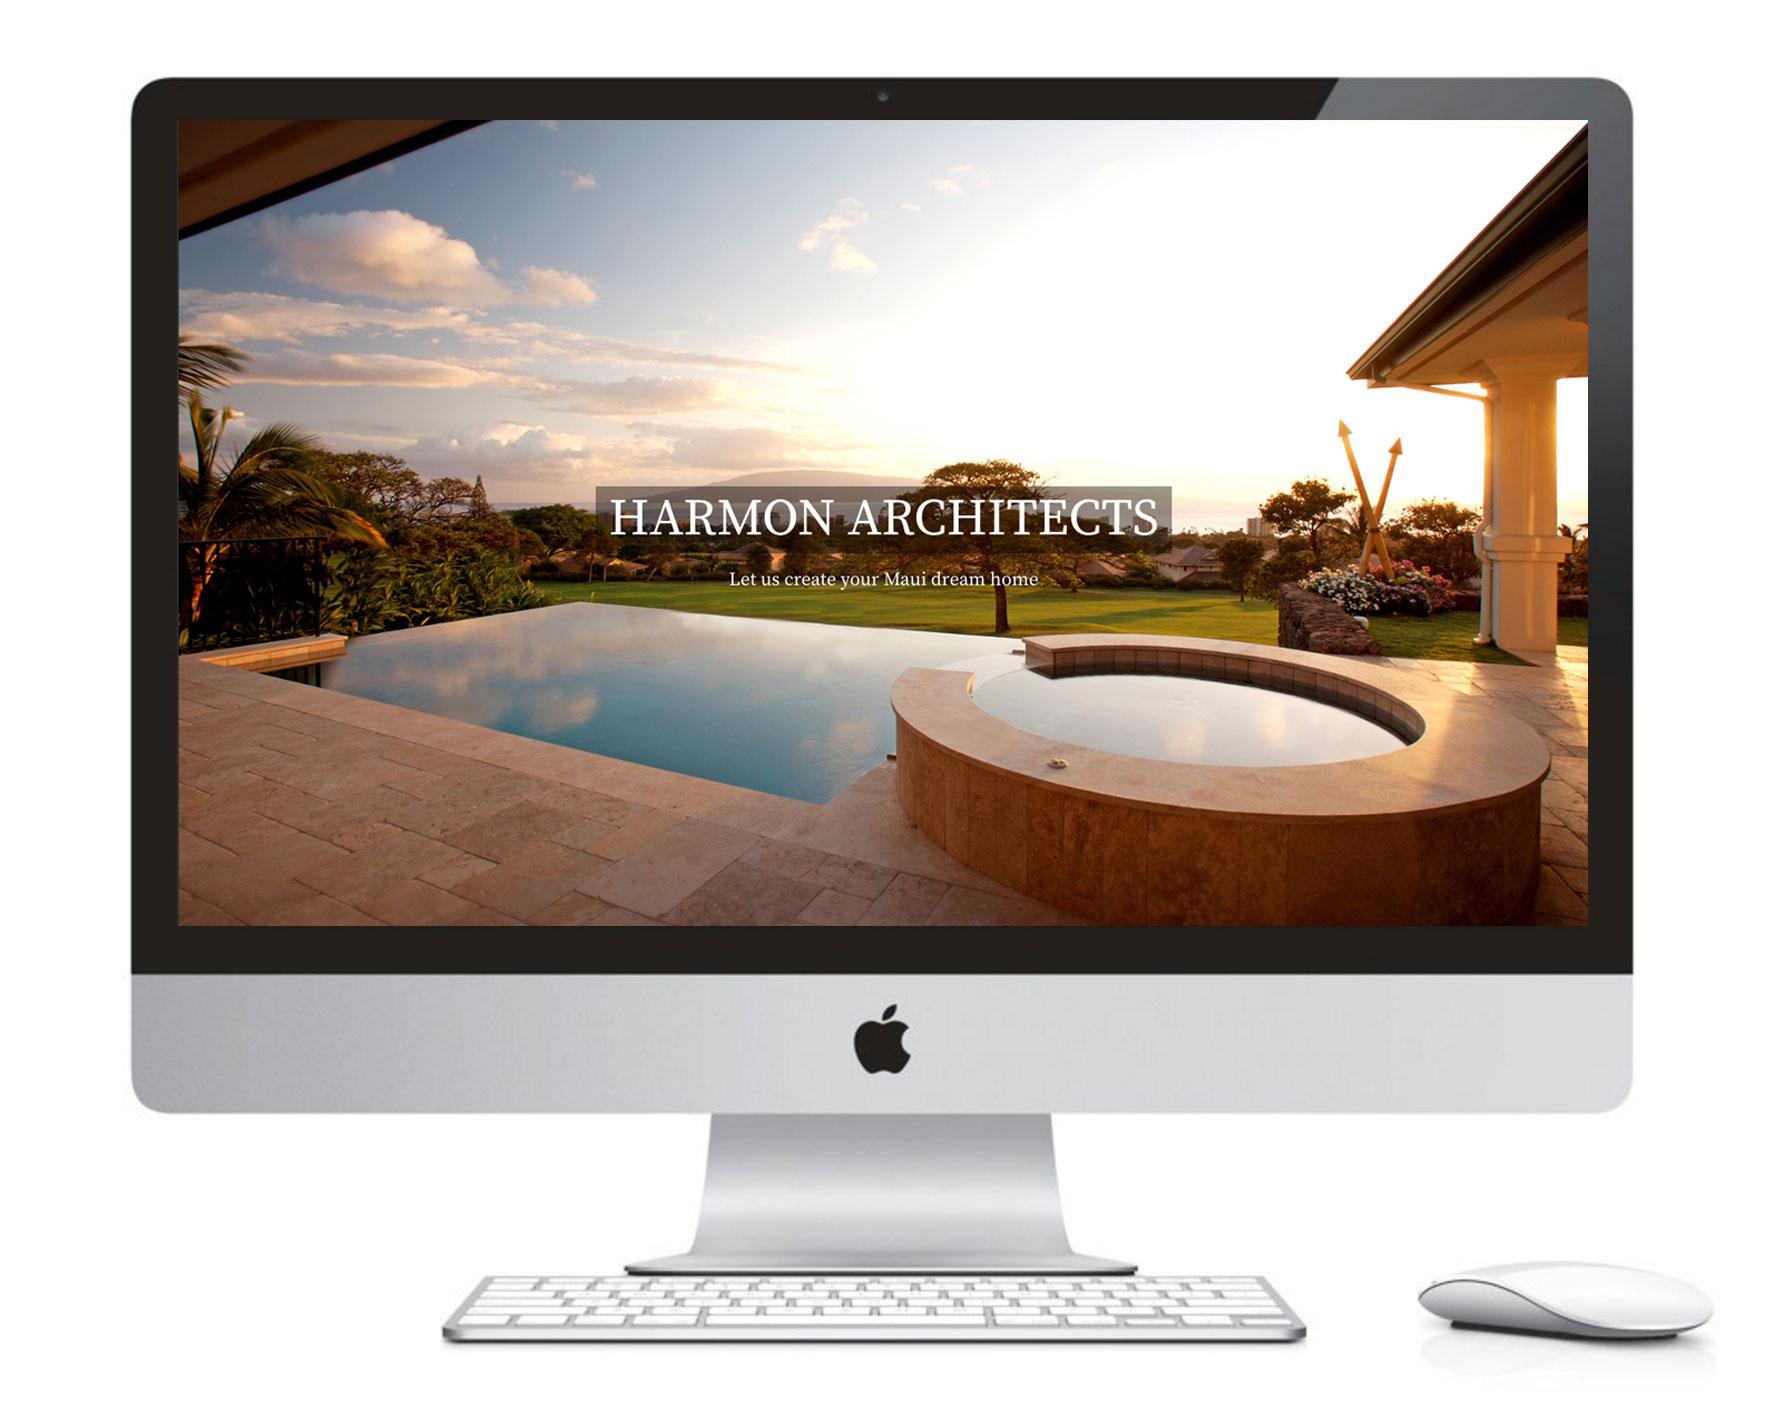 Harmon Architects